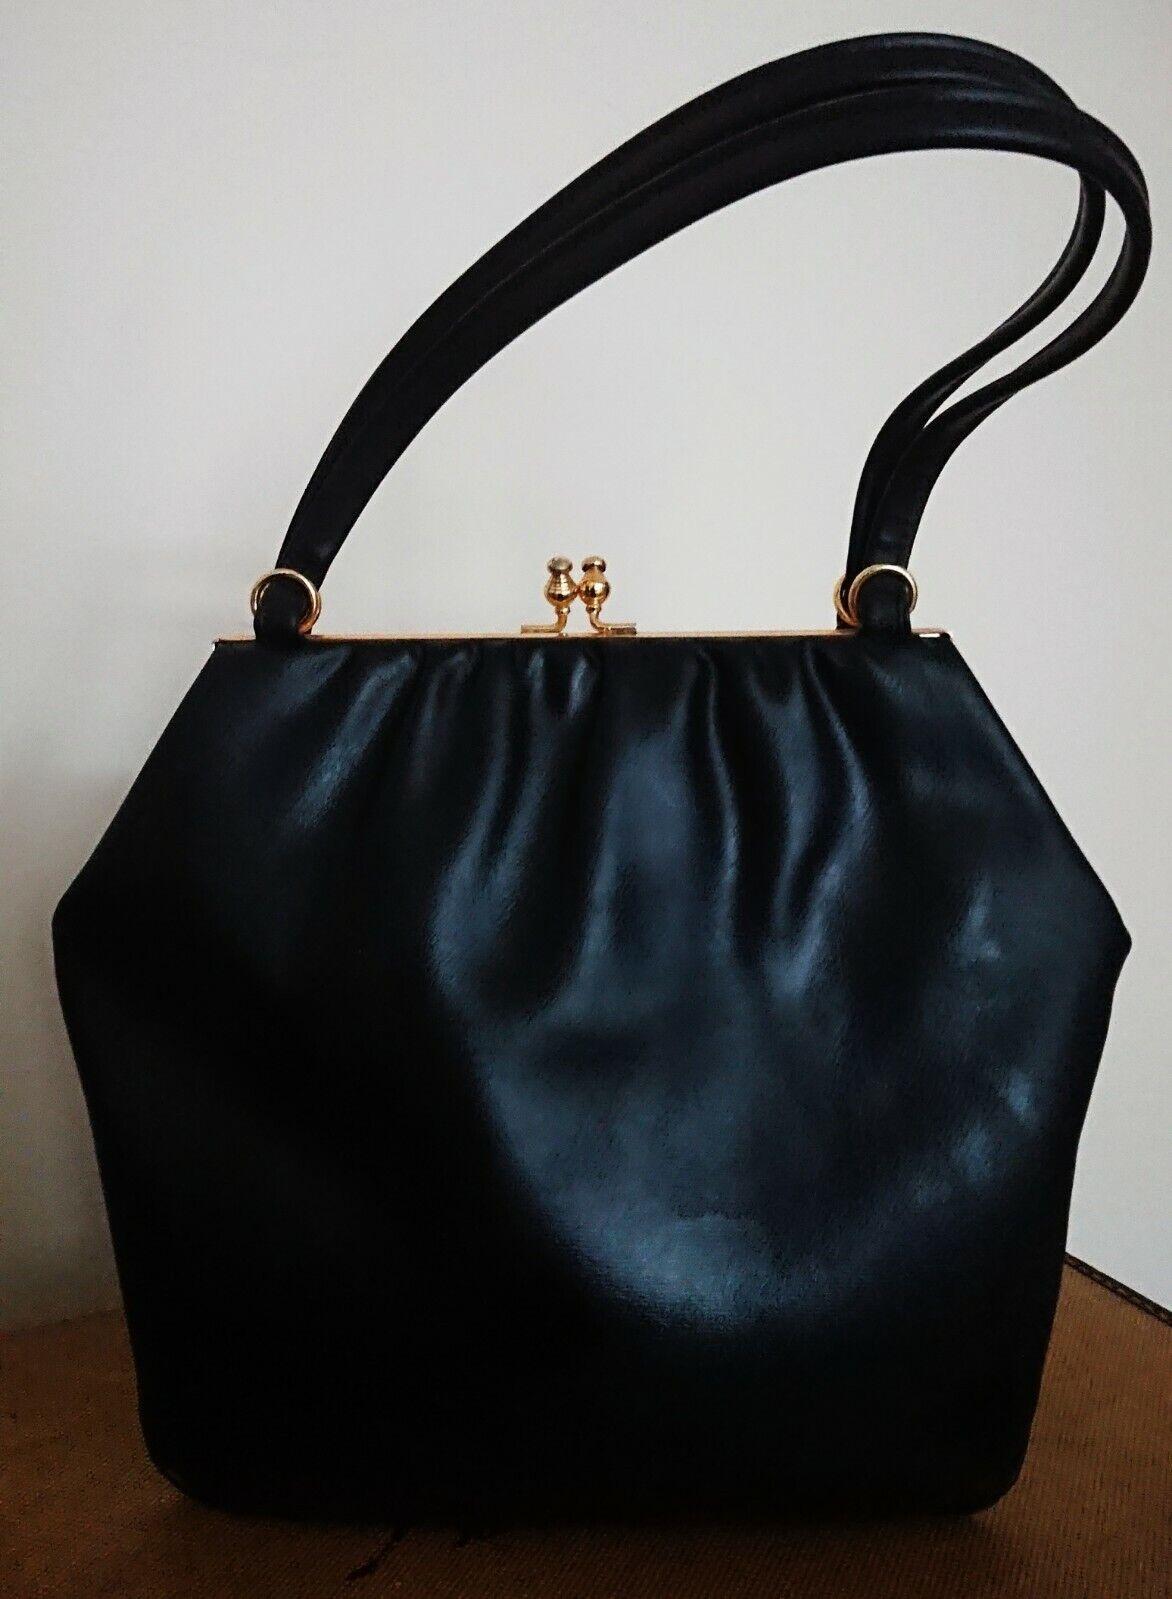 Vintage 1960s Large Faux Leather Navy Blue Handbag.